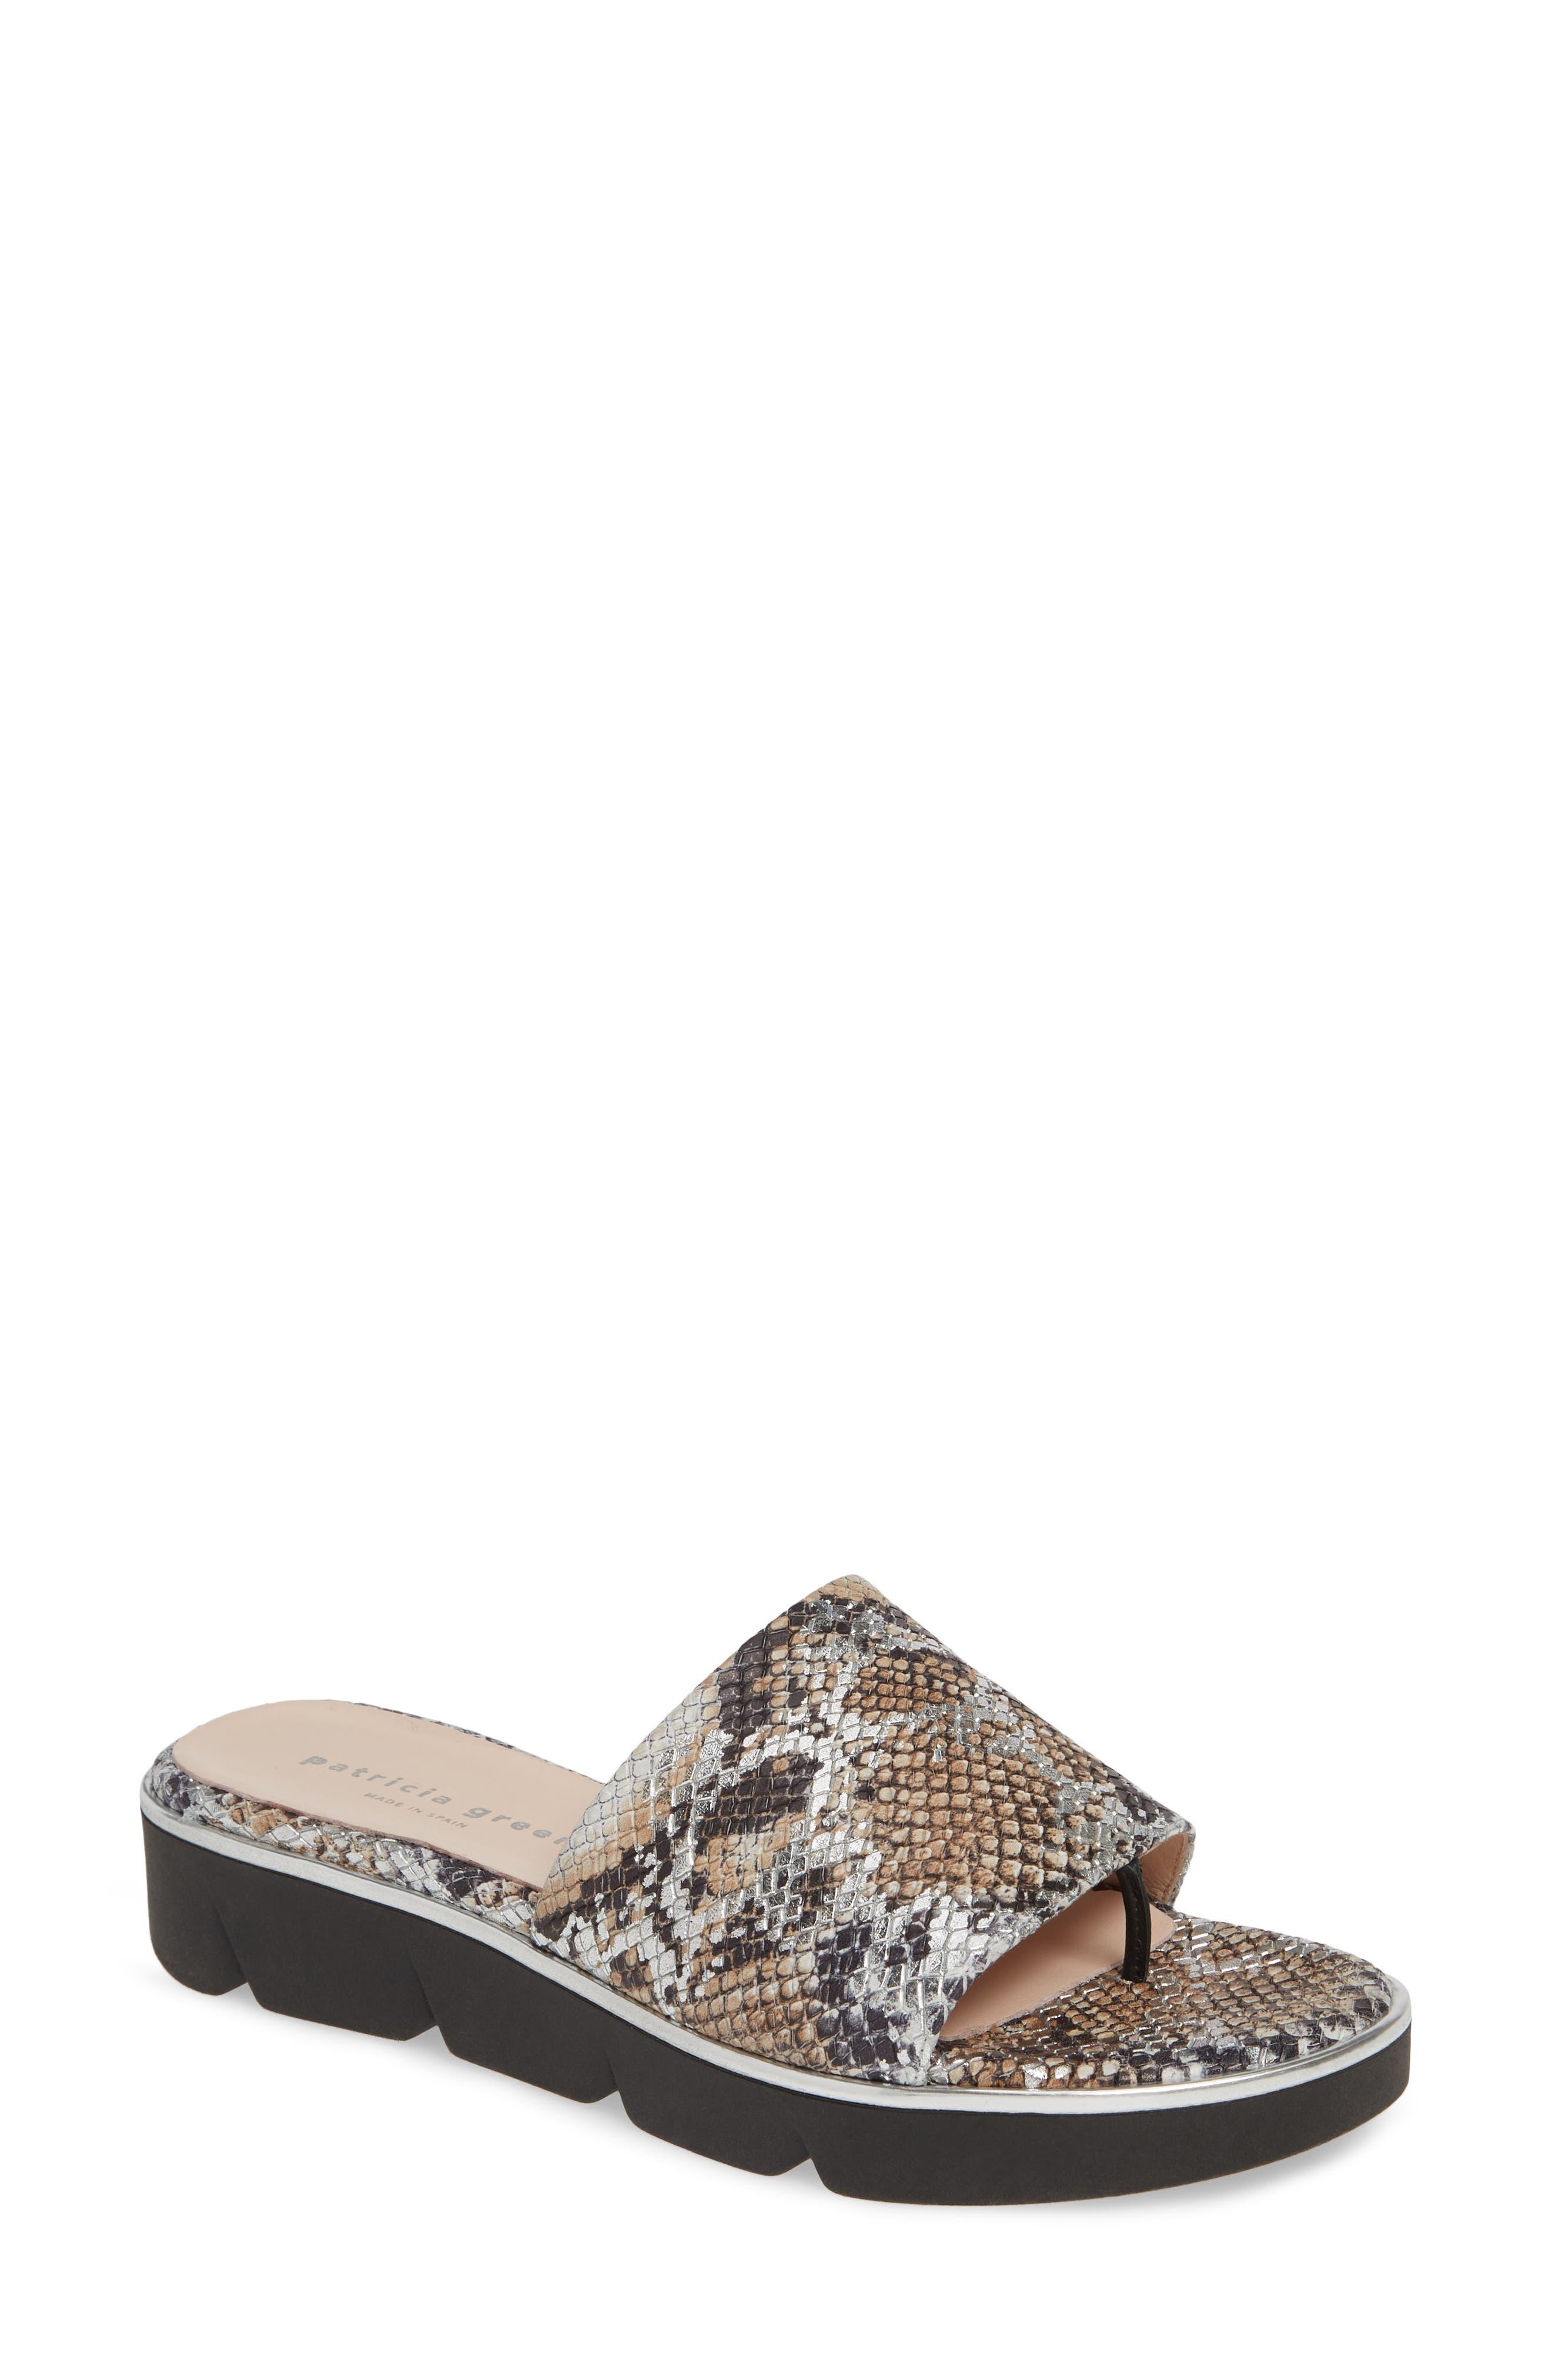 a634bc50ac5 Women's Shoes Sale | Nordstrom